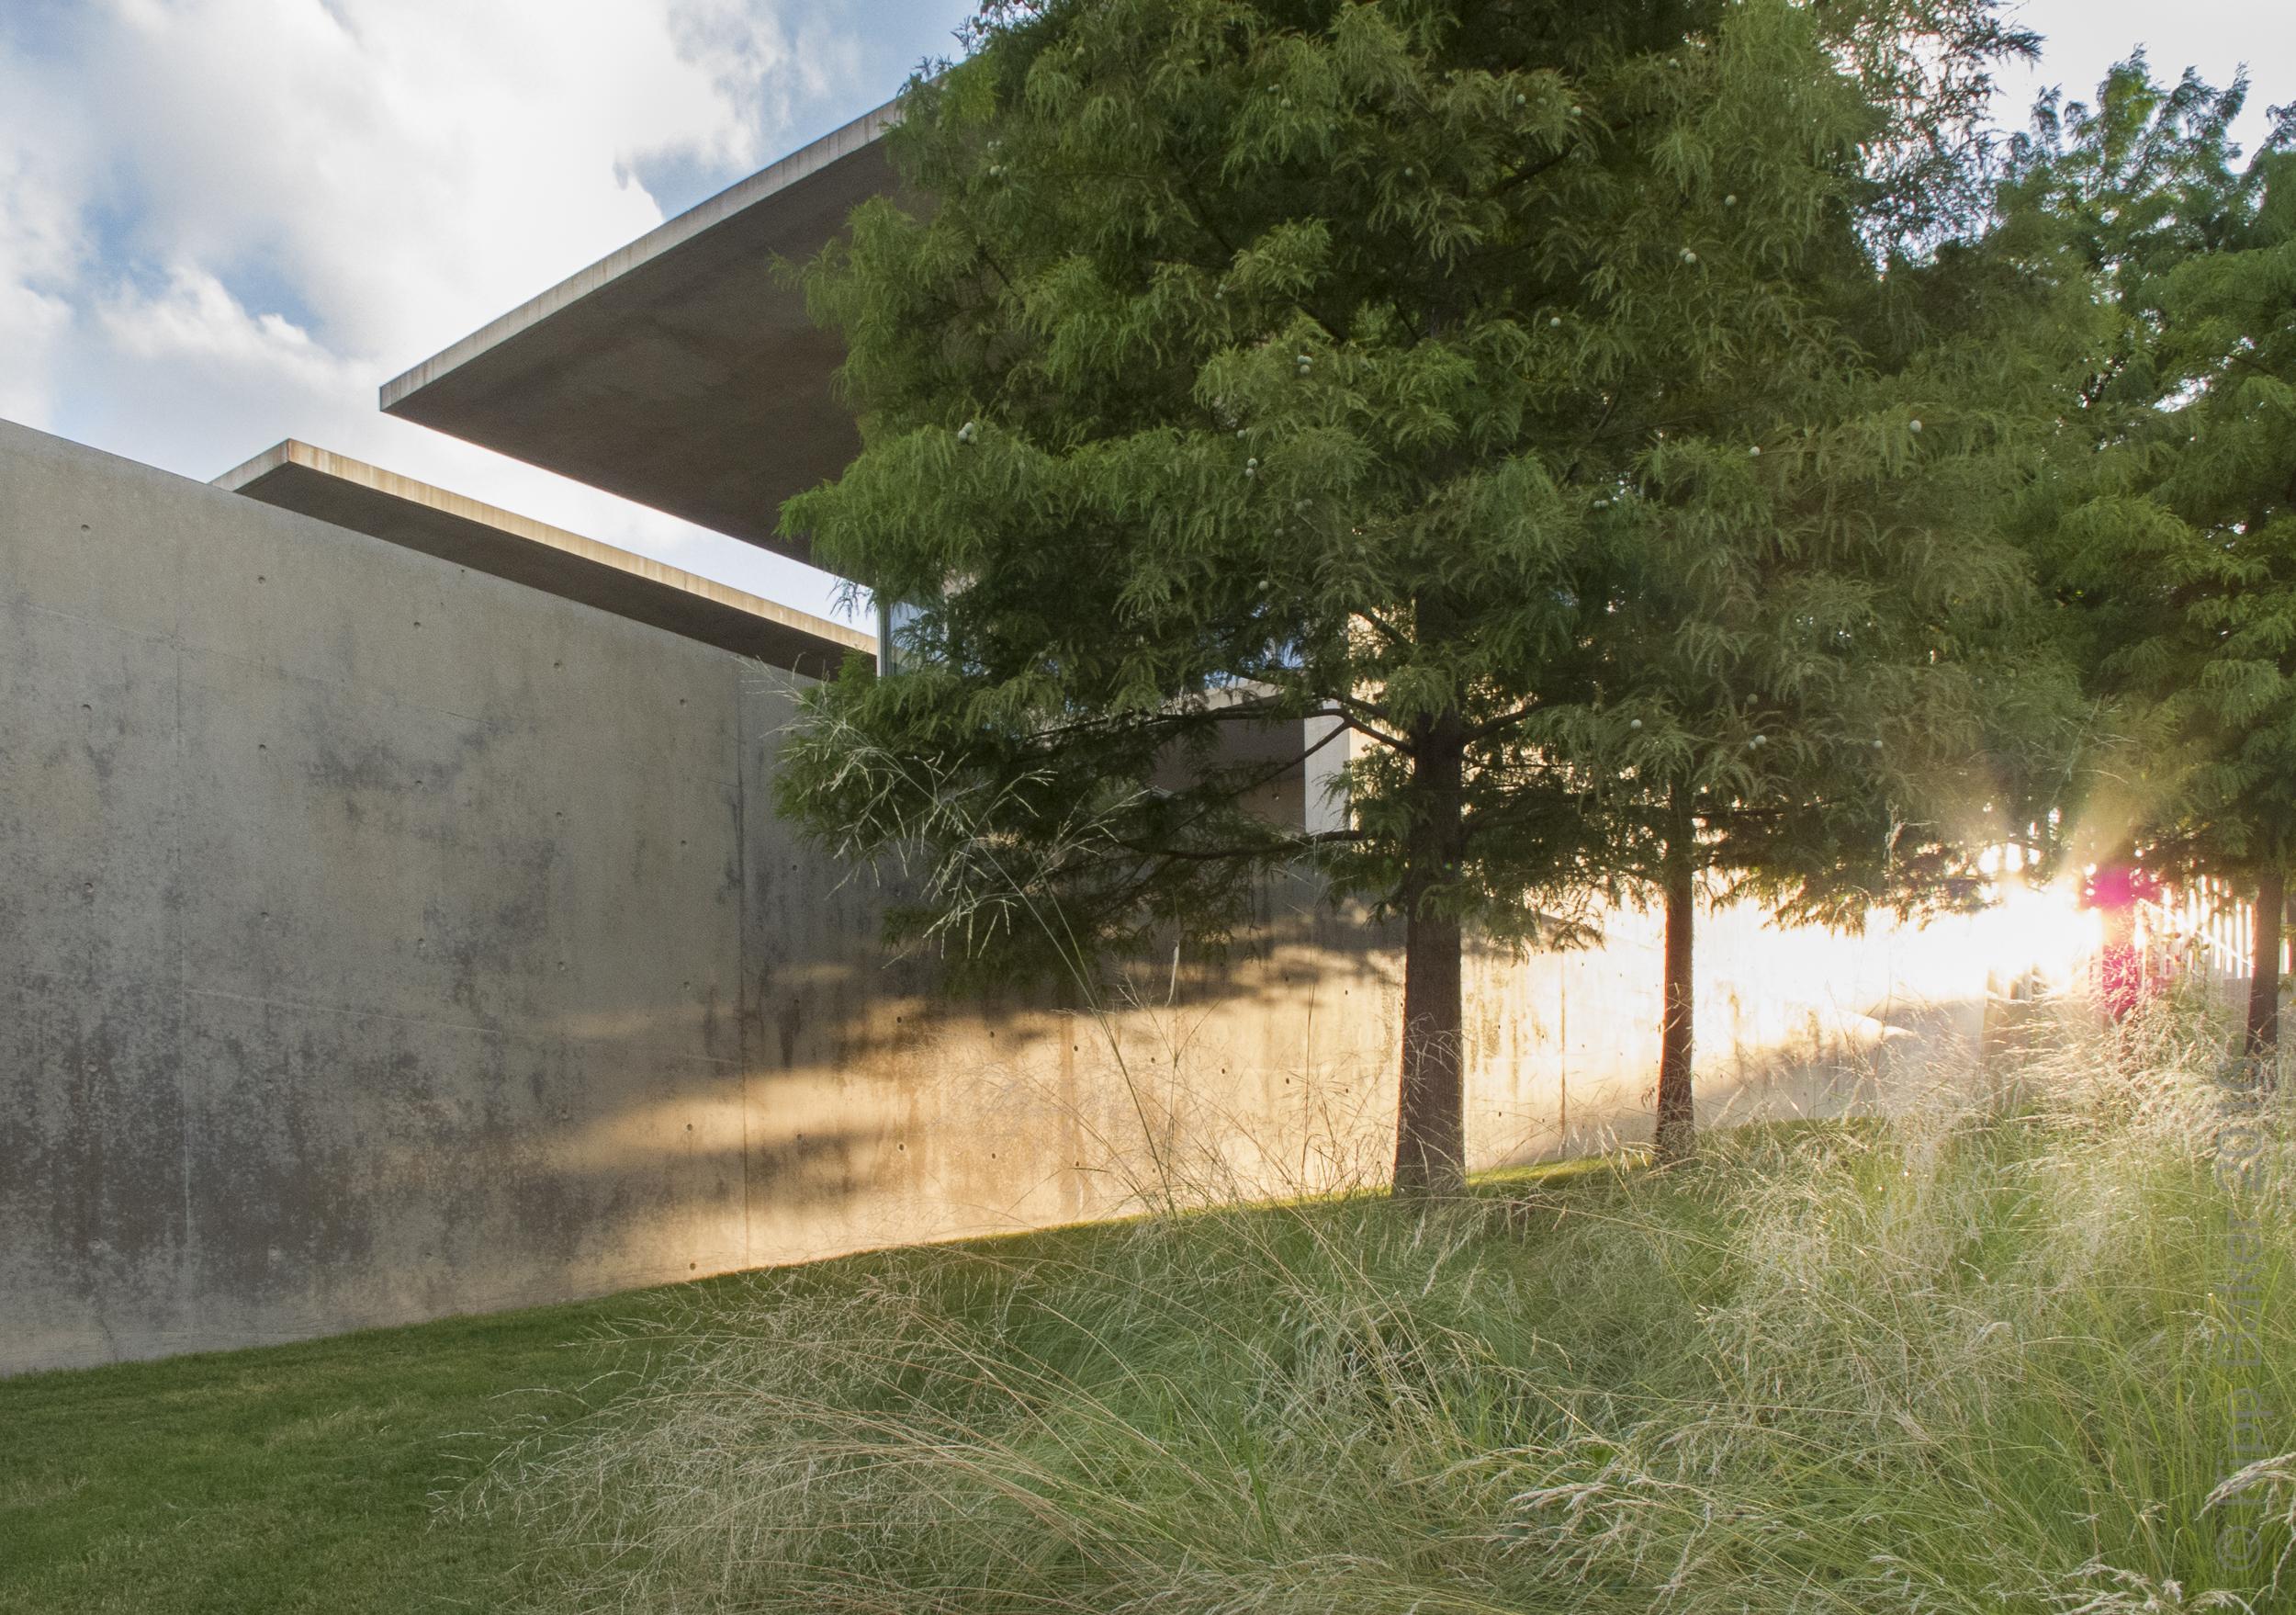 Modern Art Museum of Fort Worth Copyright © Kipp Baker, All rights reserved.